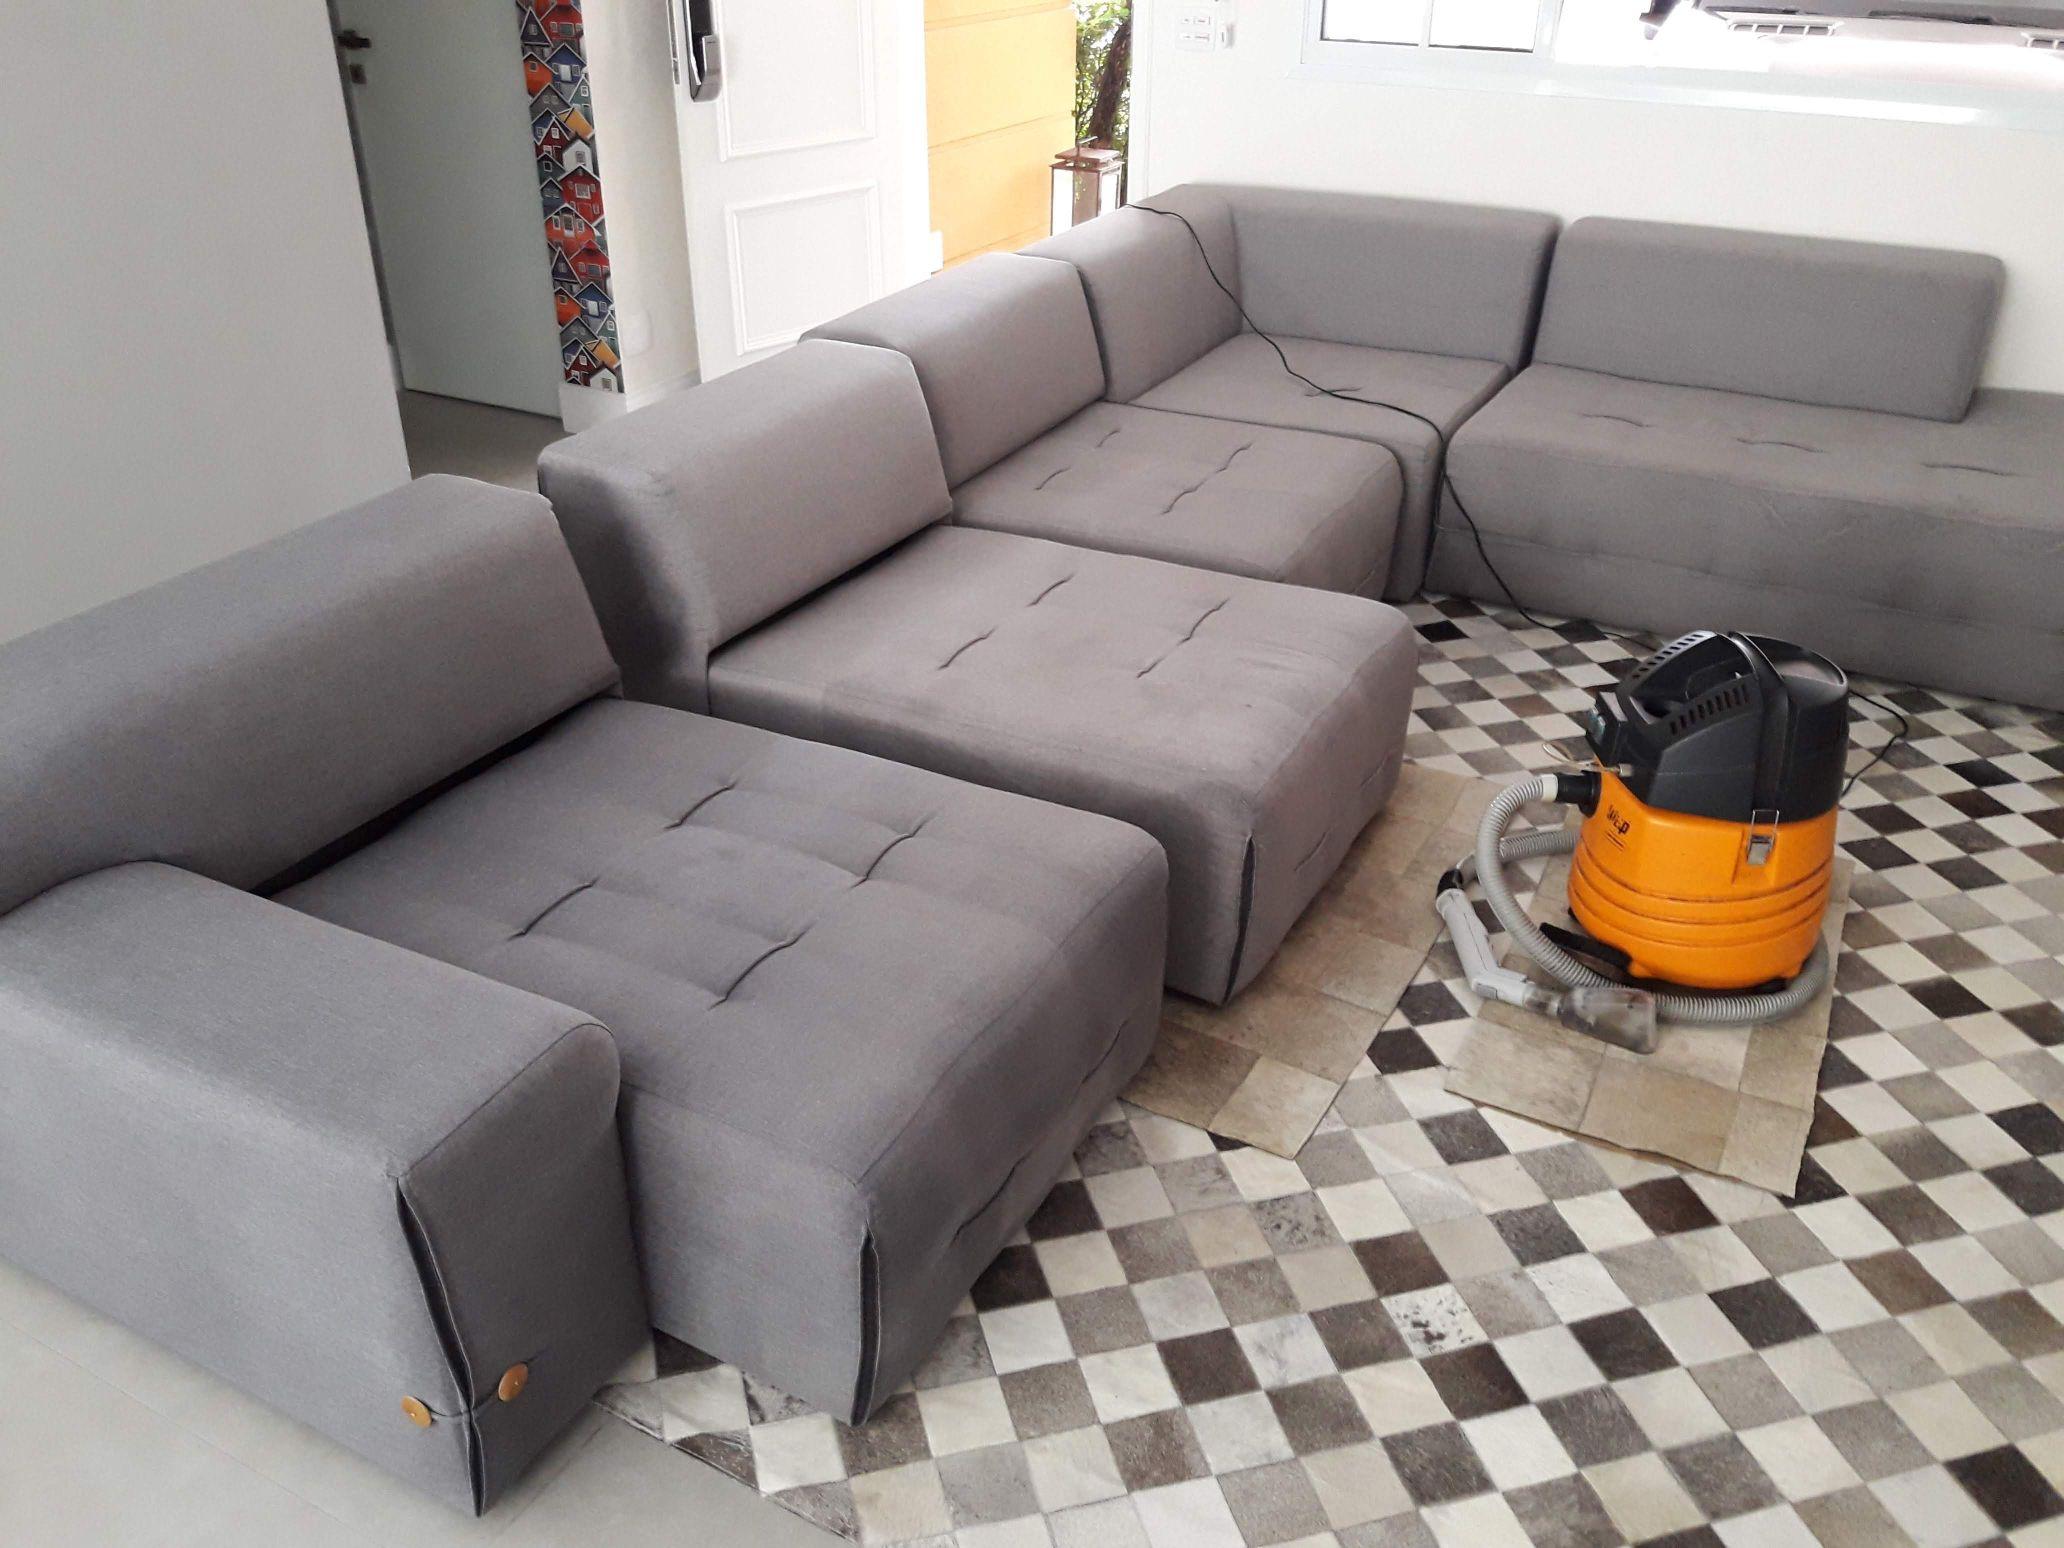 Tapete e sofá limpo